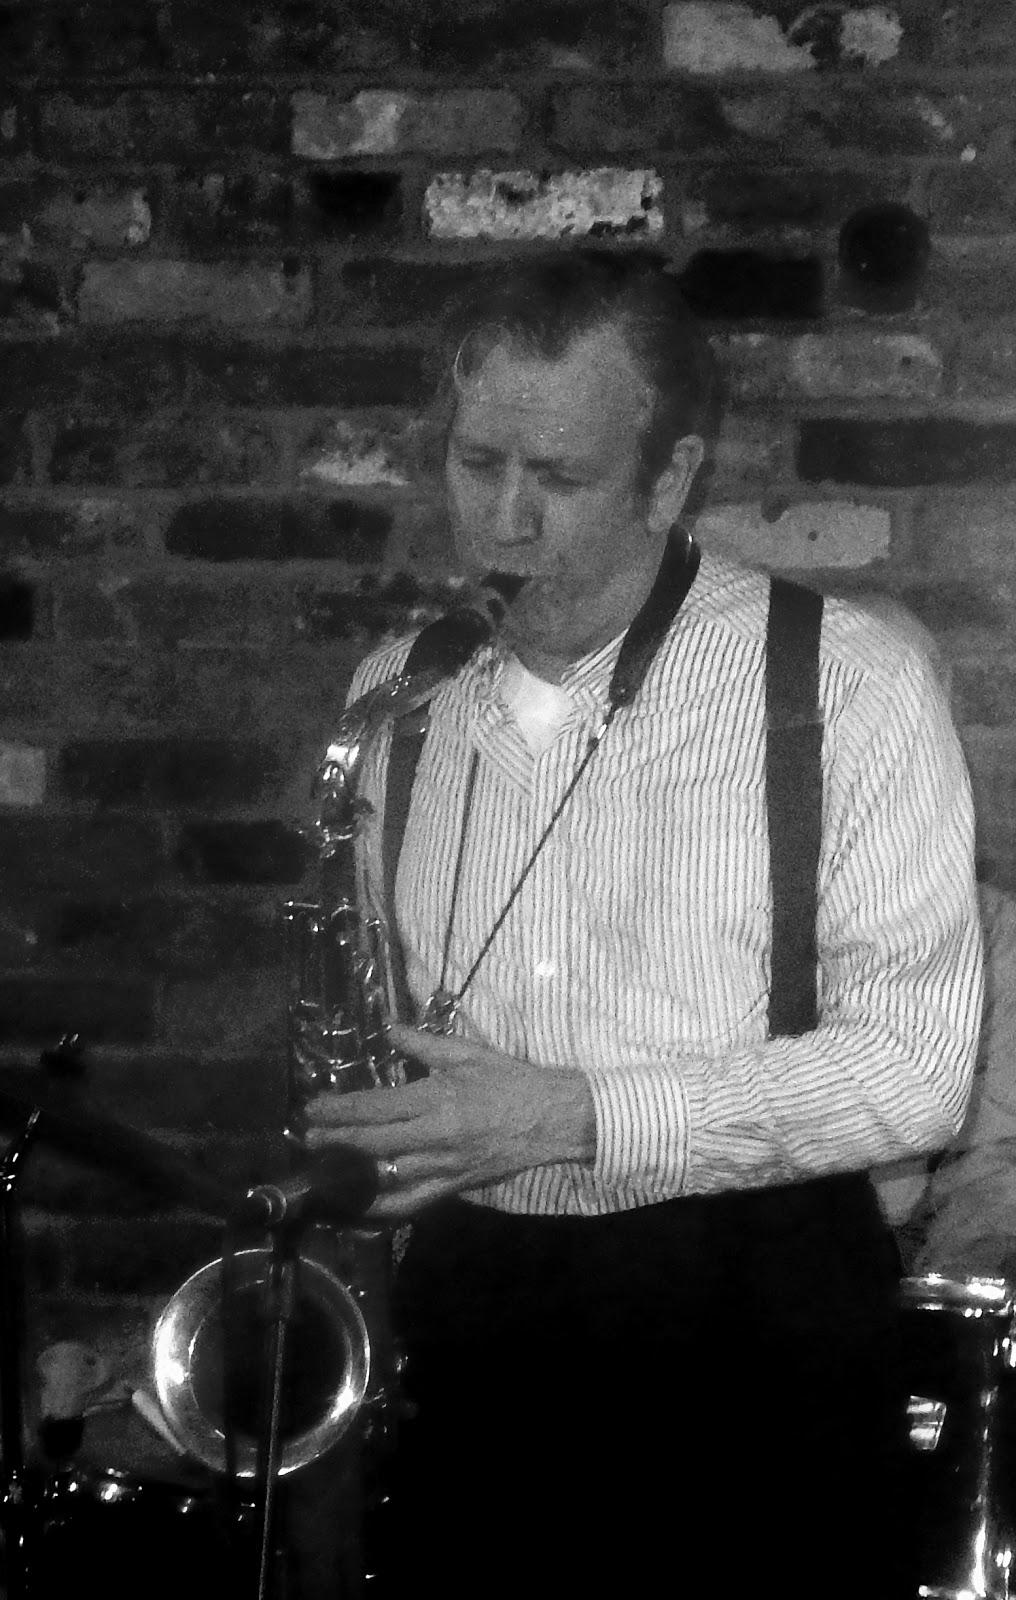 bebop spoken here: Martin Guy Band w  Sara Dowling @ Spice